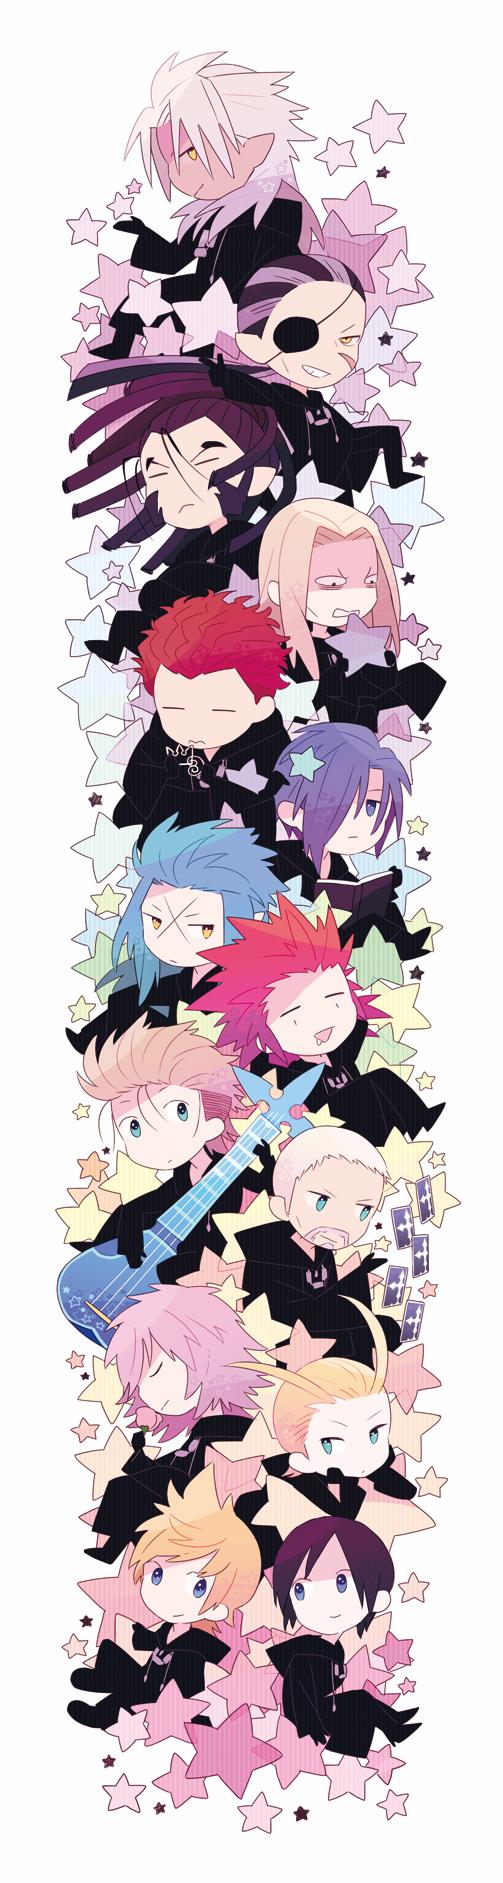 Tags: Anime, Kingdom Hearts 358/2 Days, Kingdom Hearts, Kingdom Hearts II, Demyx, Saïx, Xemnas, Roxas, Lexaeus, Marluxia, Vexen, Axel (Kingdom Hearts), Larxene